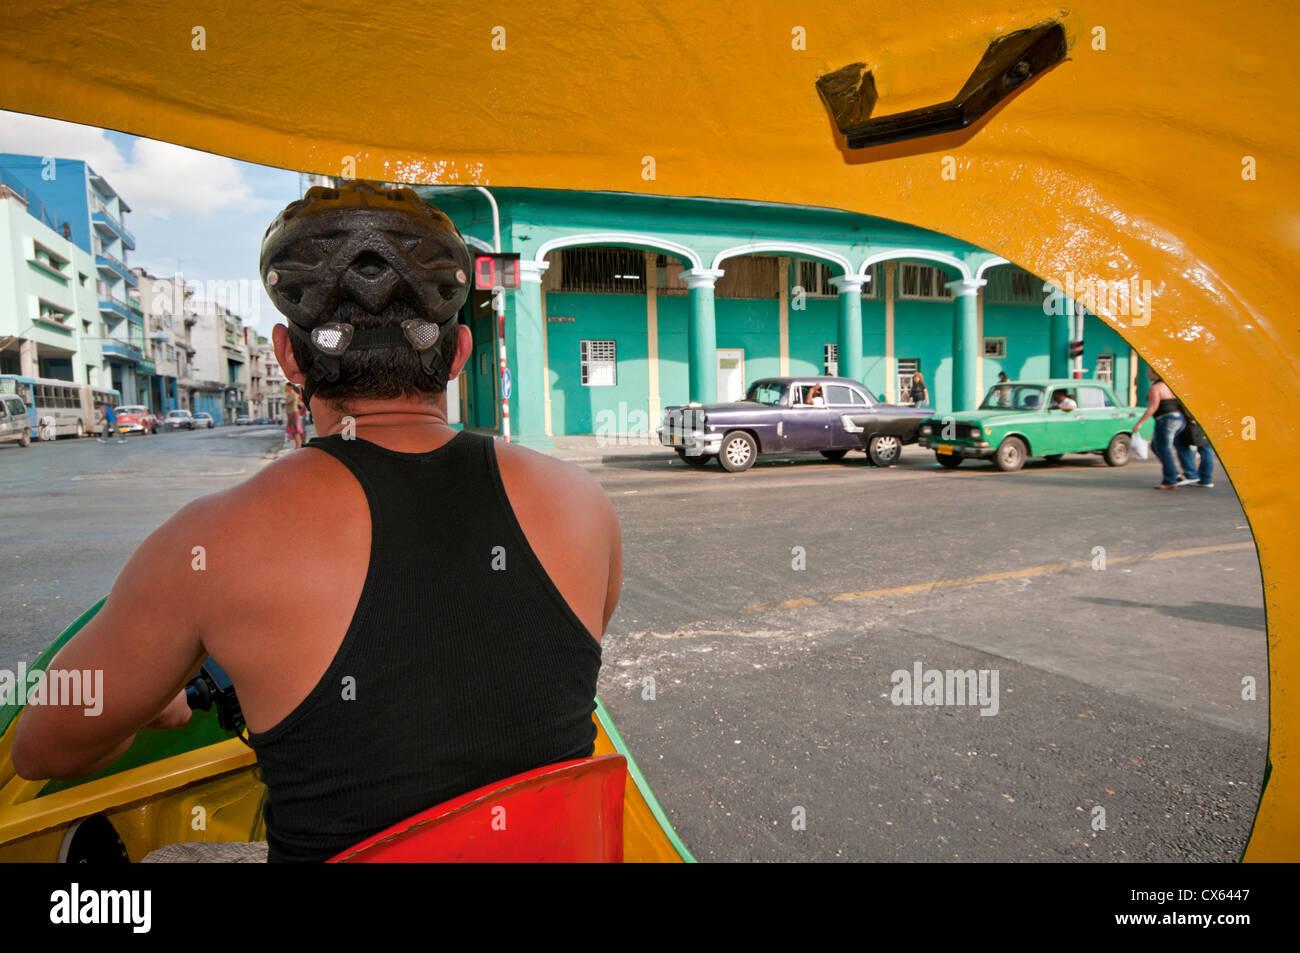 Un Cocotaxi jaune 3 roues scooter Taxi, Habana Vedado, La Havane, Cuba, Caraïbes Photo Stock